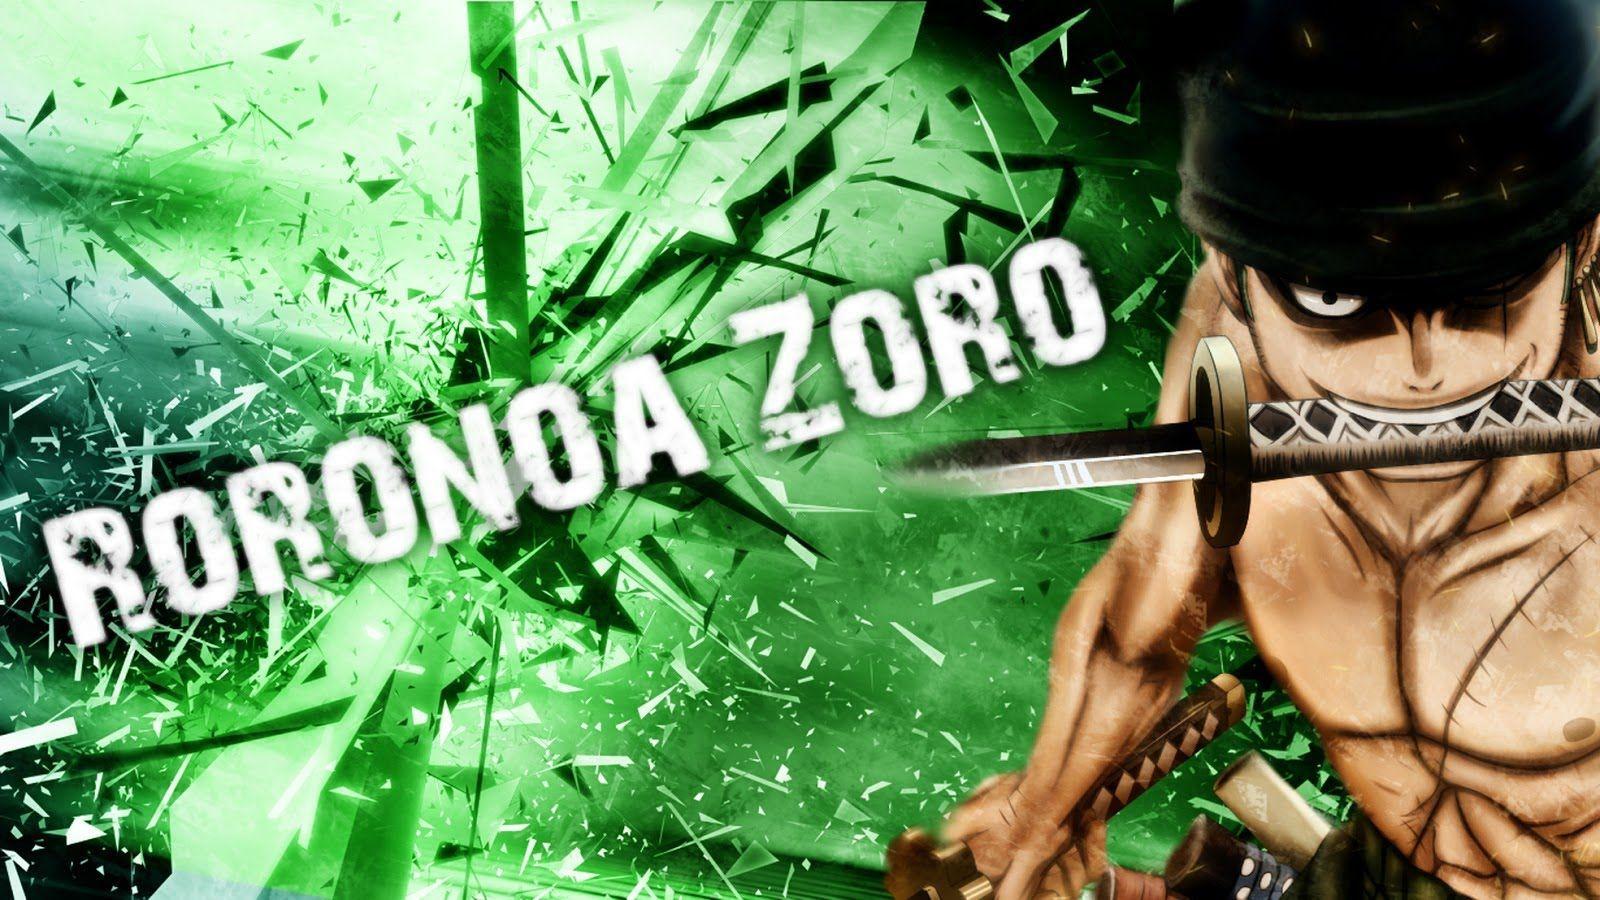 Roronoa Zoro Hd Wallpapers Wallpaper Cave